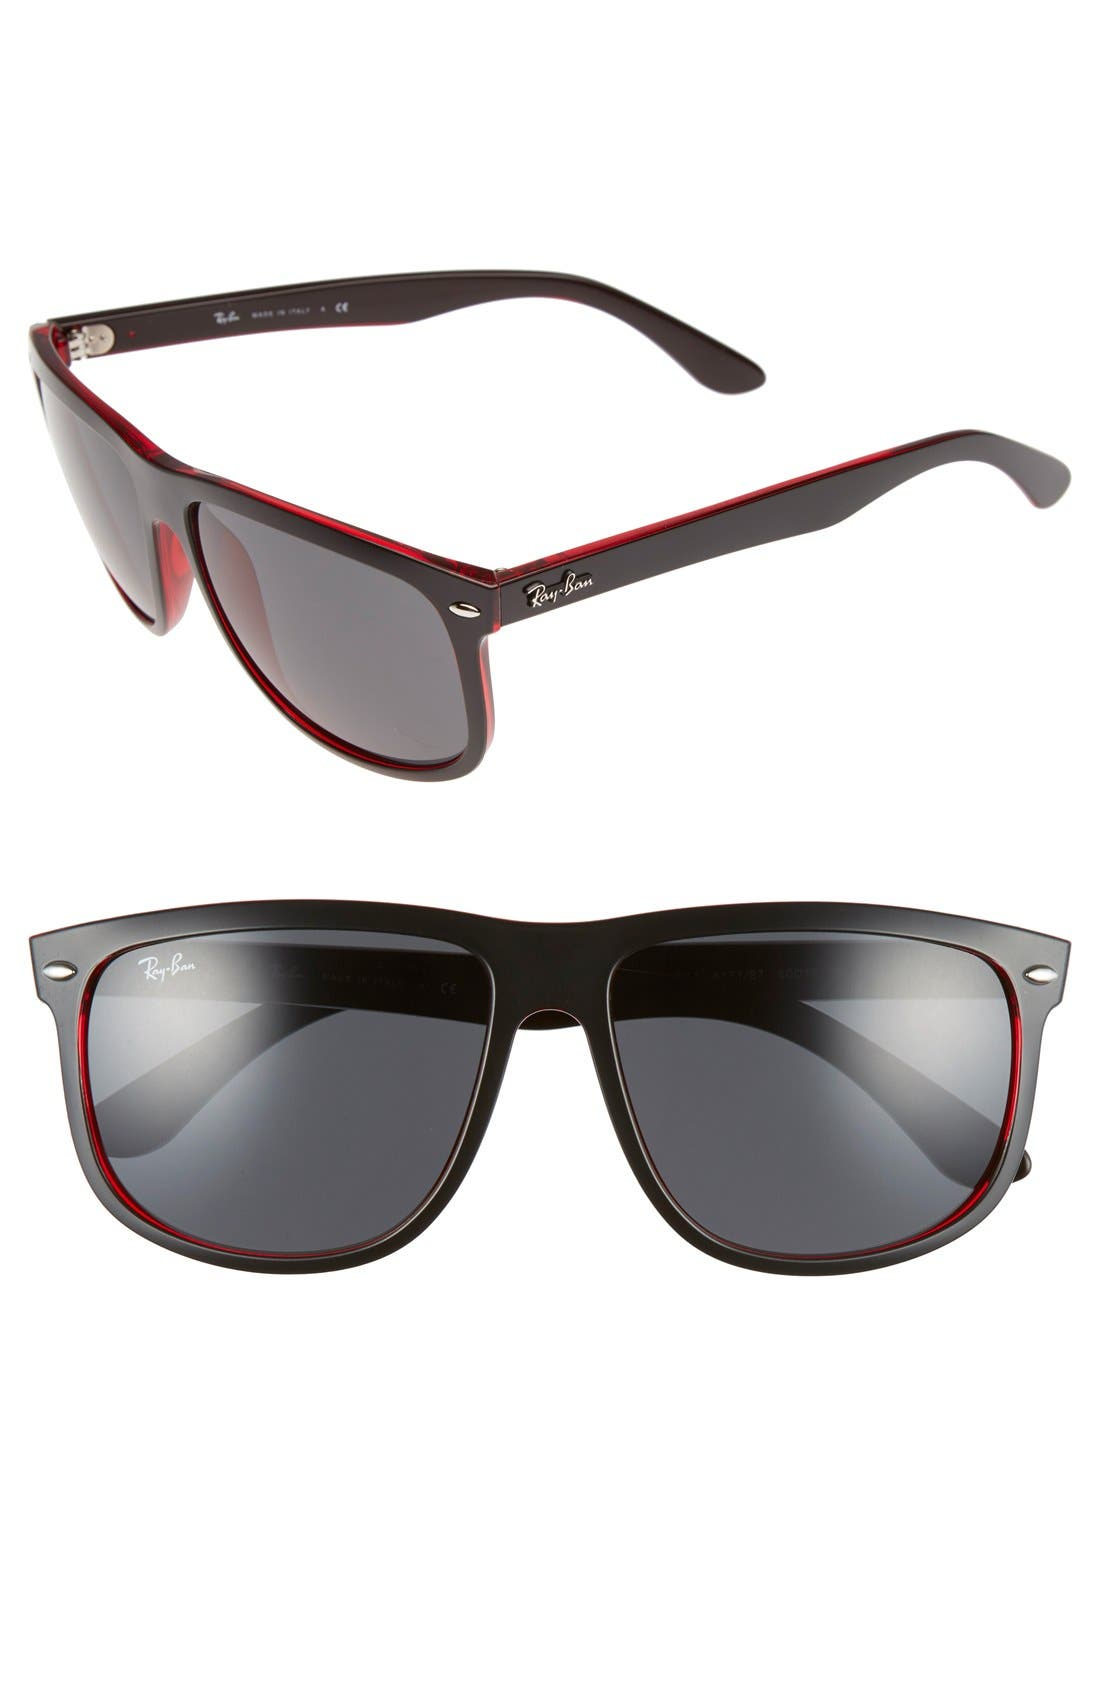 Main Image - Ray-Ban Boyfriend 60mm Flat Top Sunglasses